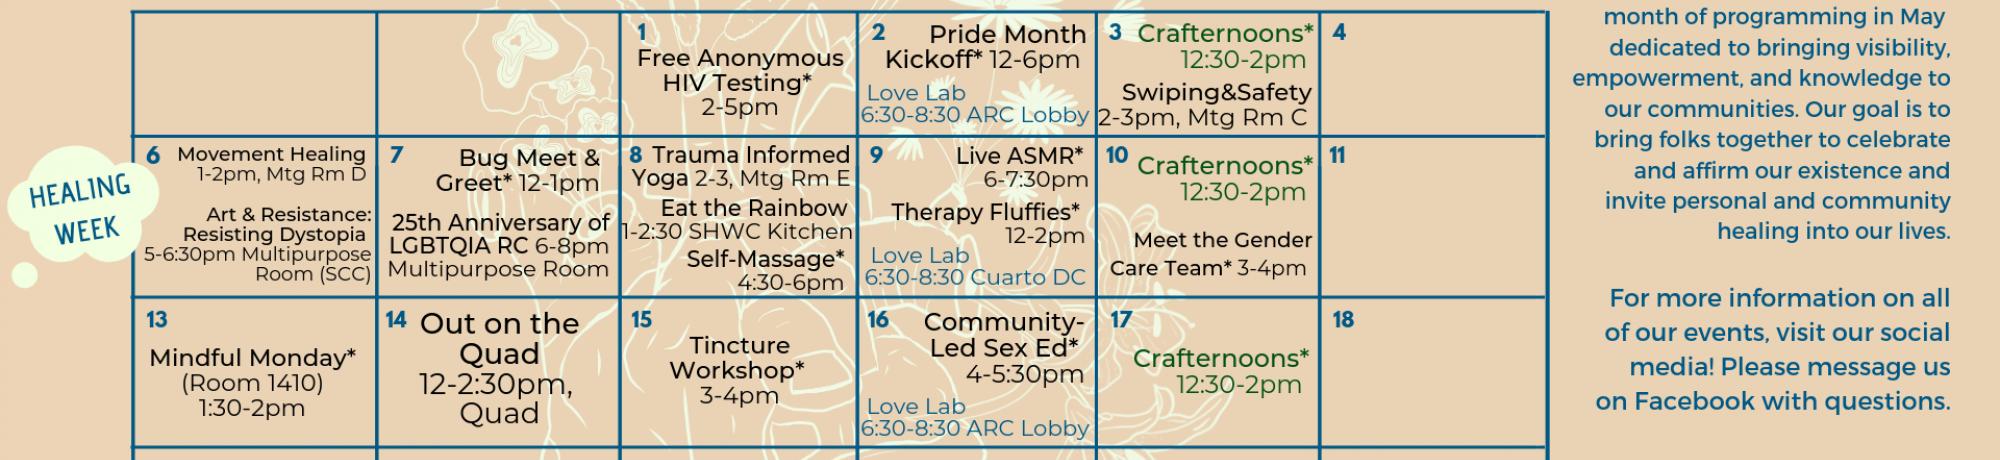 Pride Month Calendar 2019.Pride Month Lgbtqia Resource Center